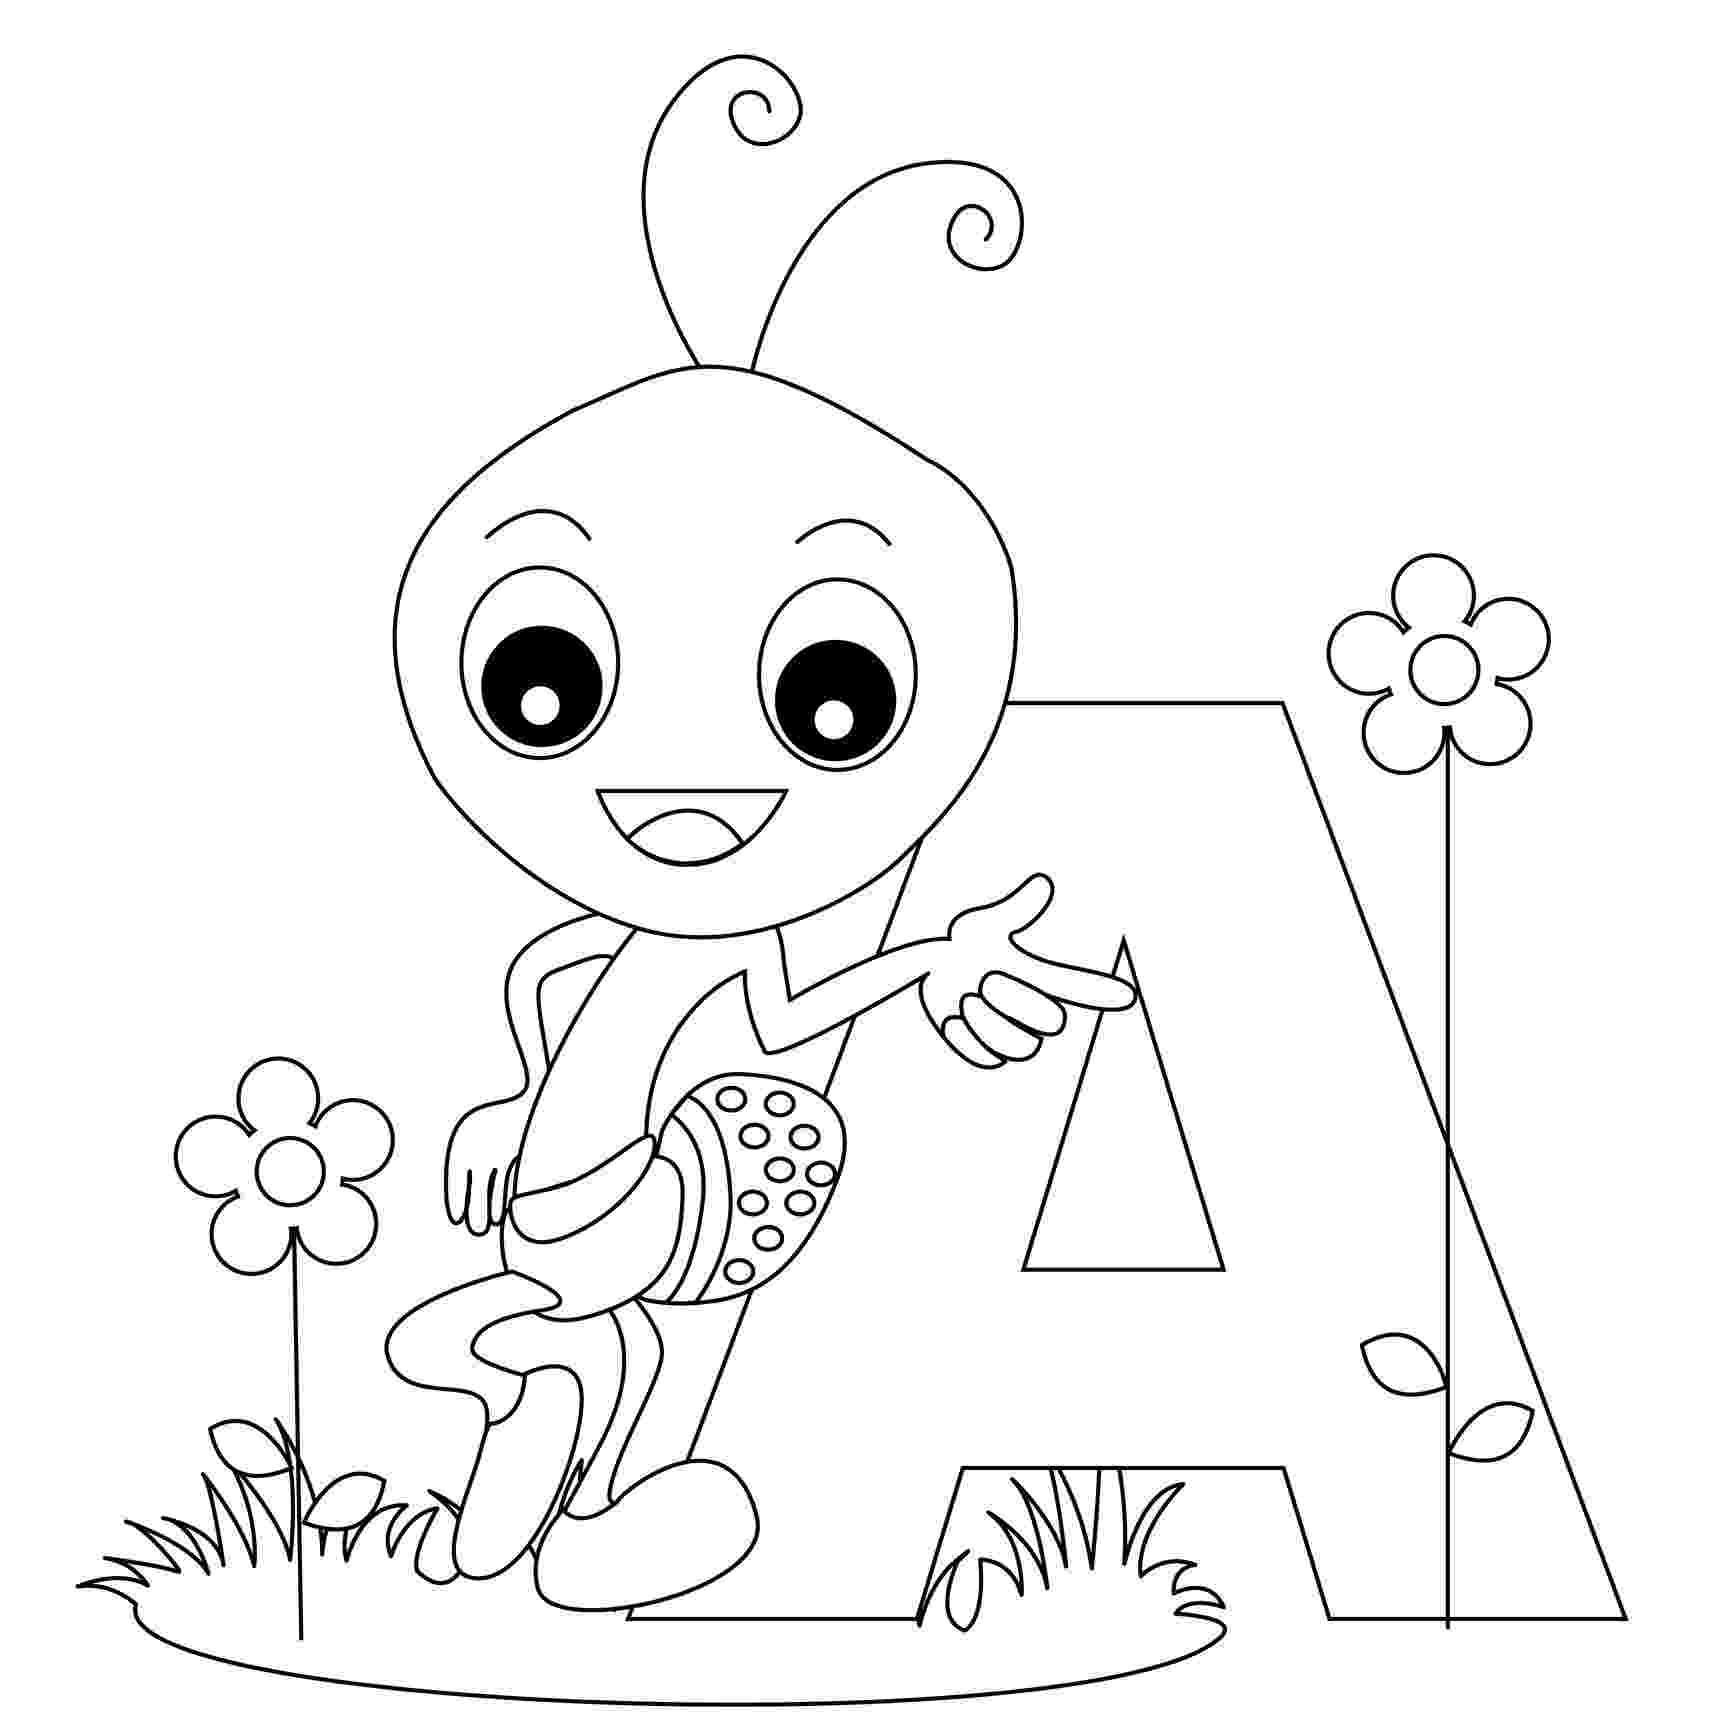 abc coloring sheets free printable alphabet coloring pages for kids best sheets abc coloring